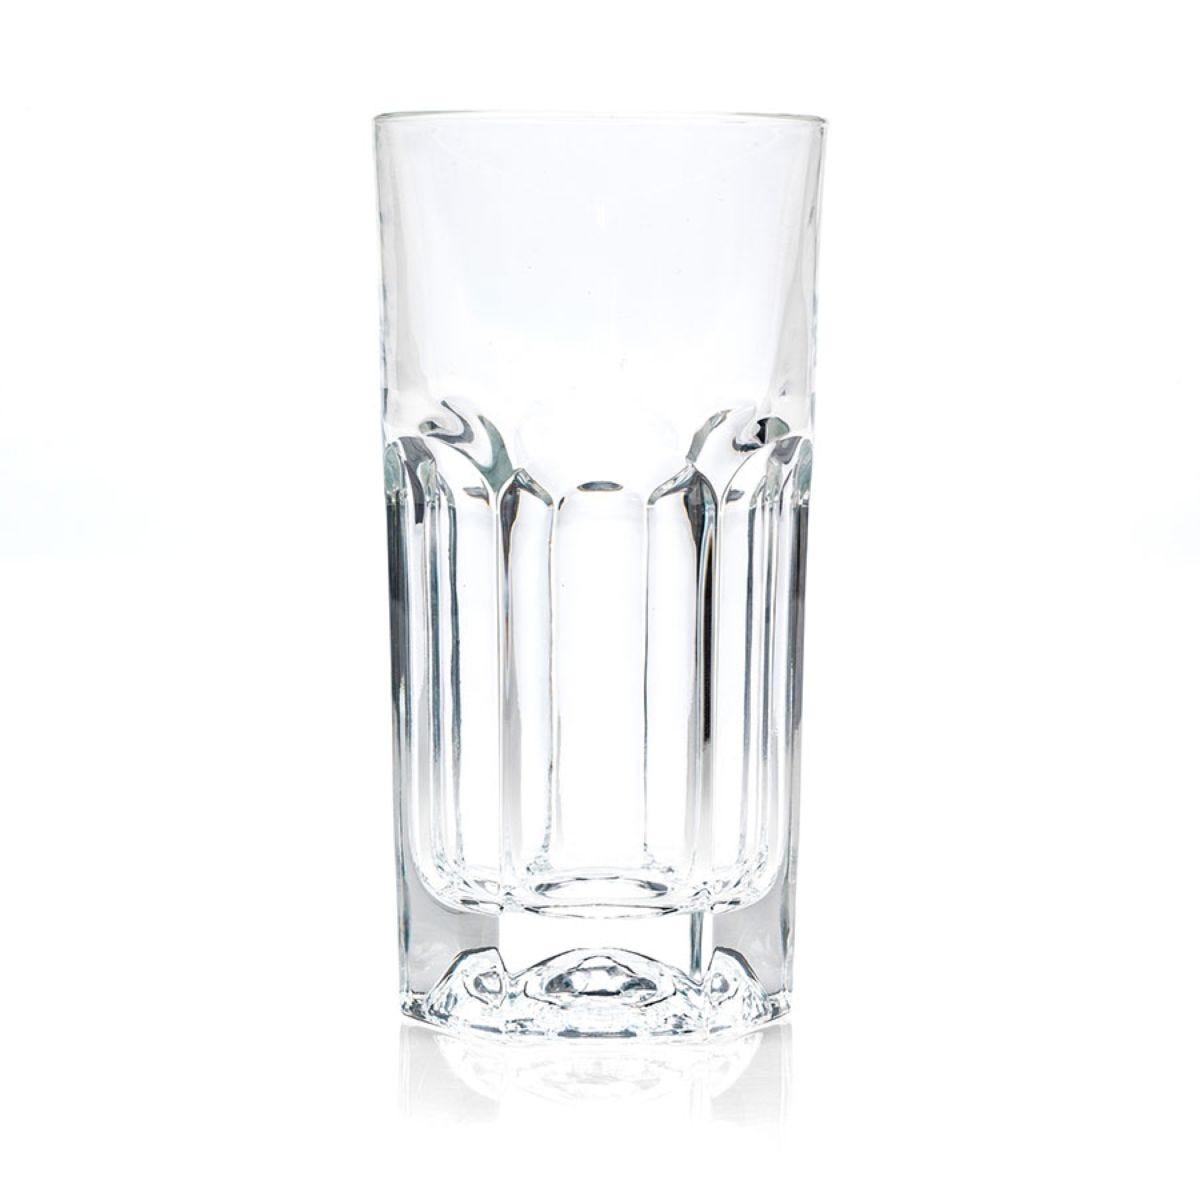 RCR Provenza 370ml Crystal Hi-ball Glasses - Set of 6